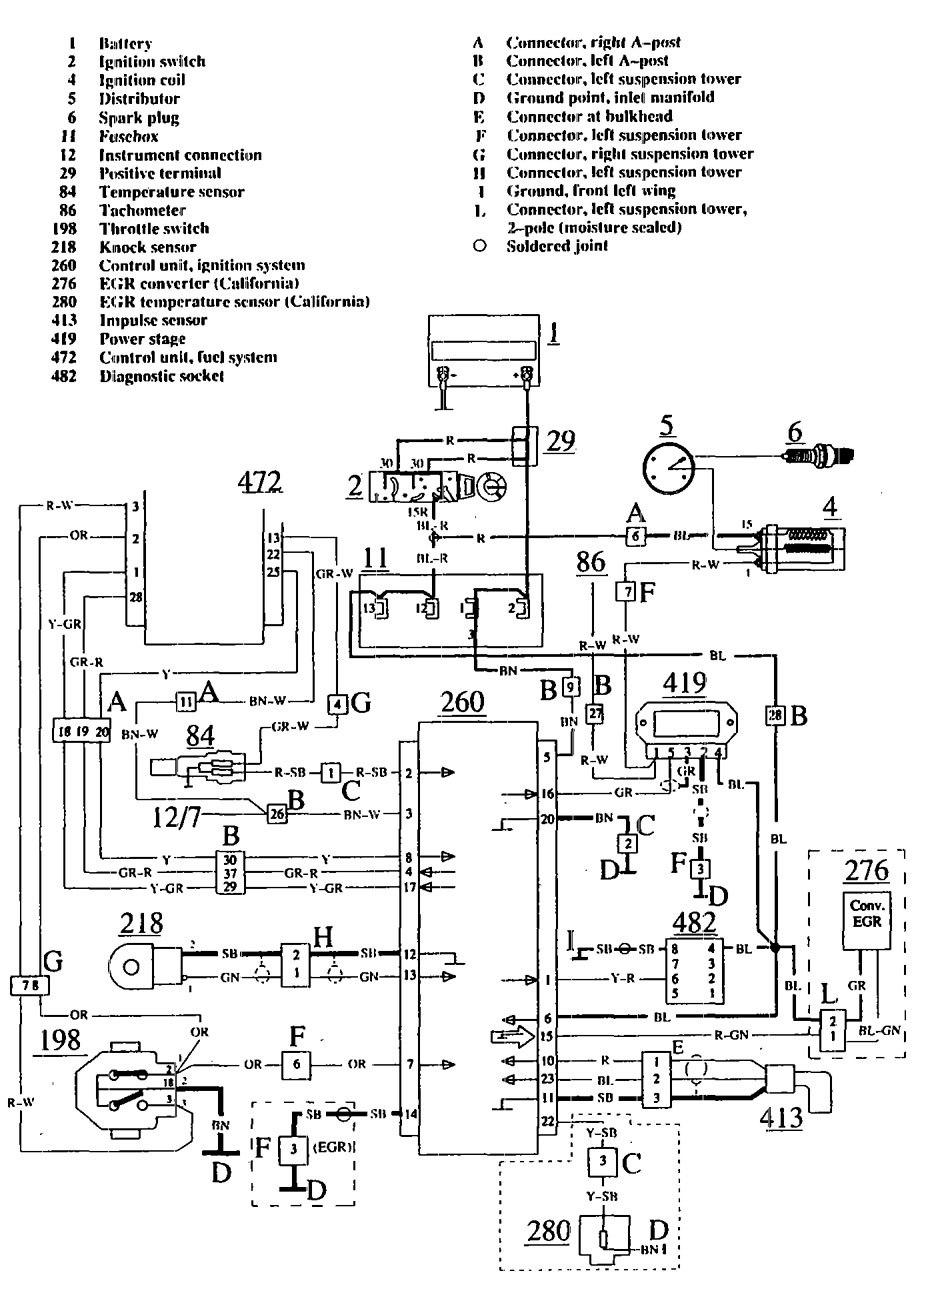 volvo aq131 distributor wiring diagram auto electrical wiring diagram related volvo aq131 distributor wiring diagram